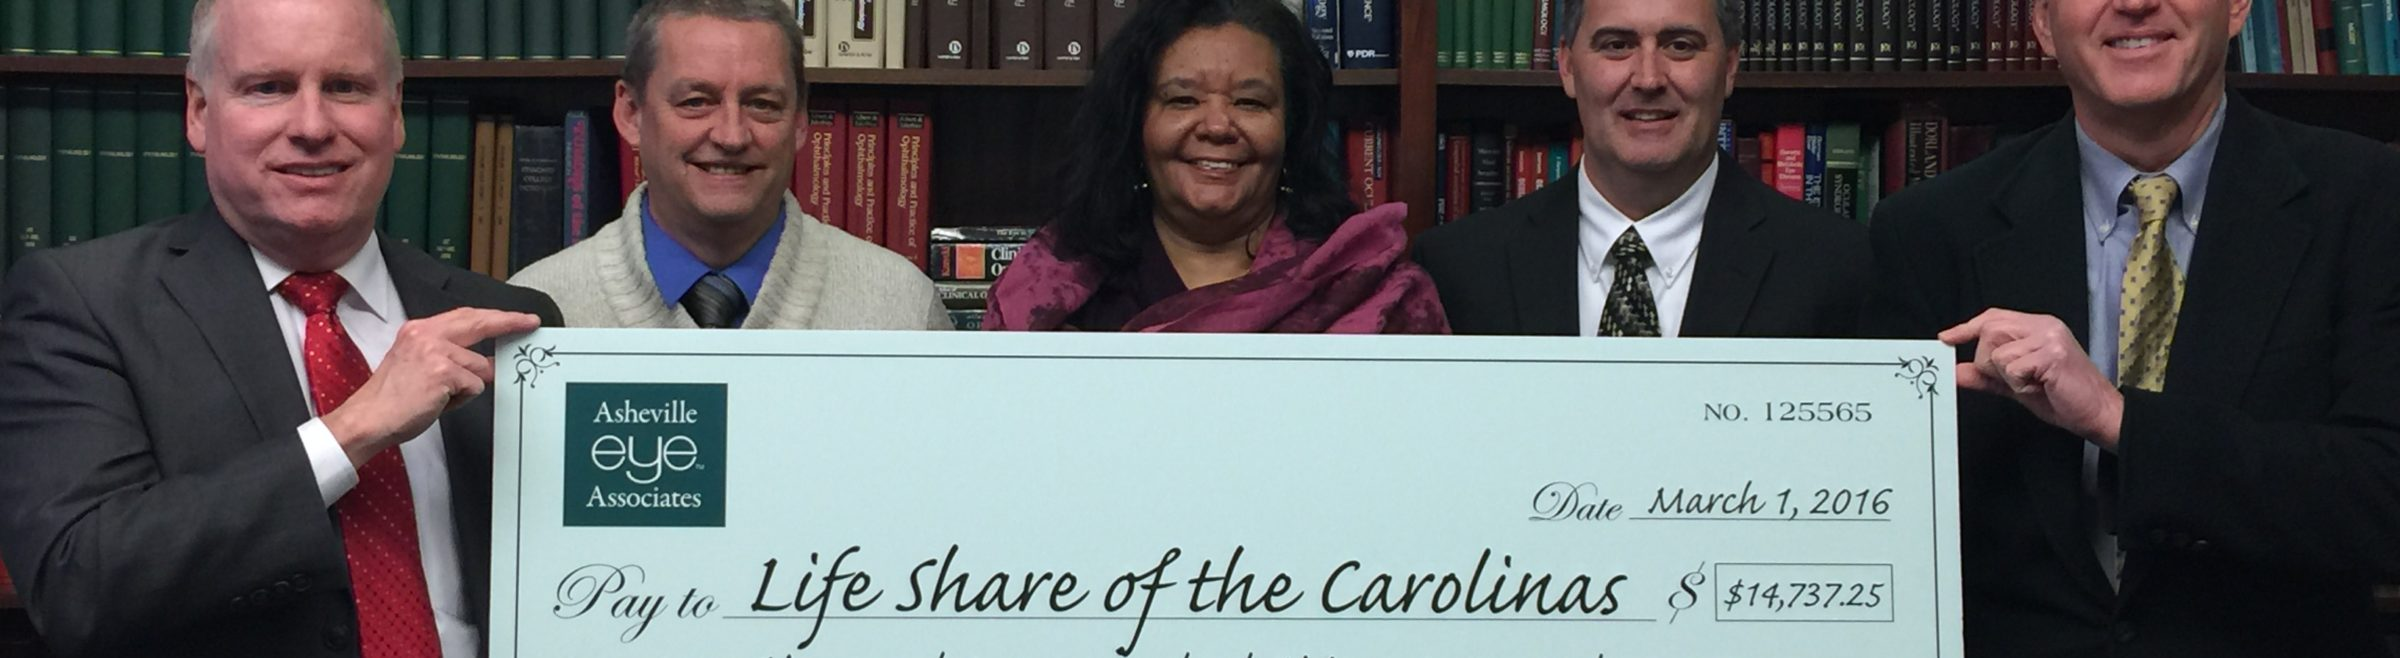 Asheville Eye Associates Presents nearly $15K to LifeShare of the Carolinas